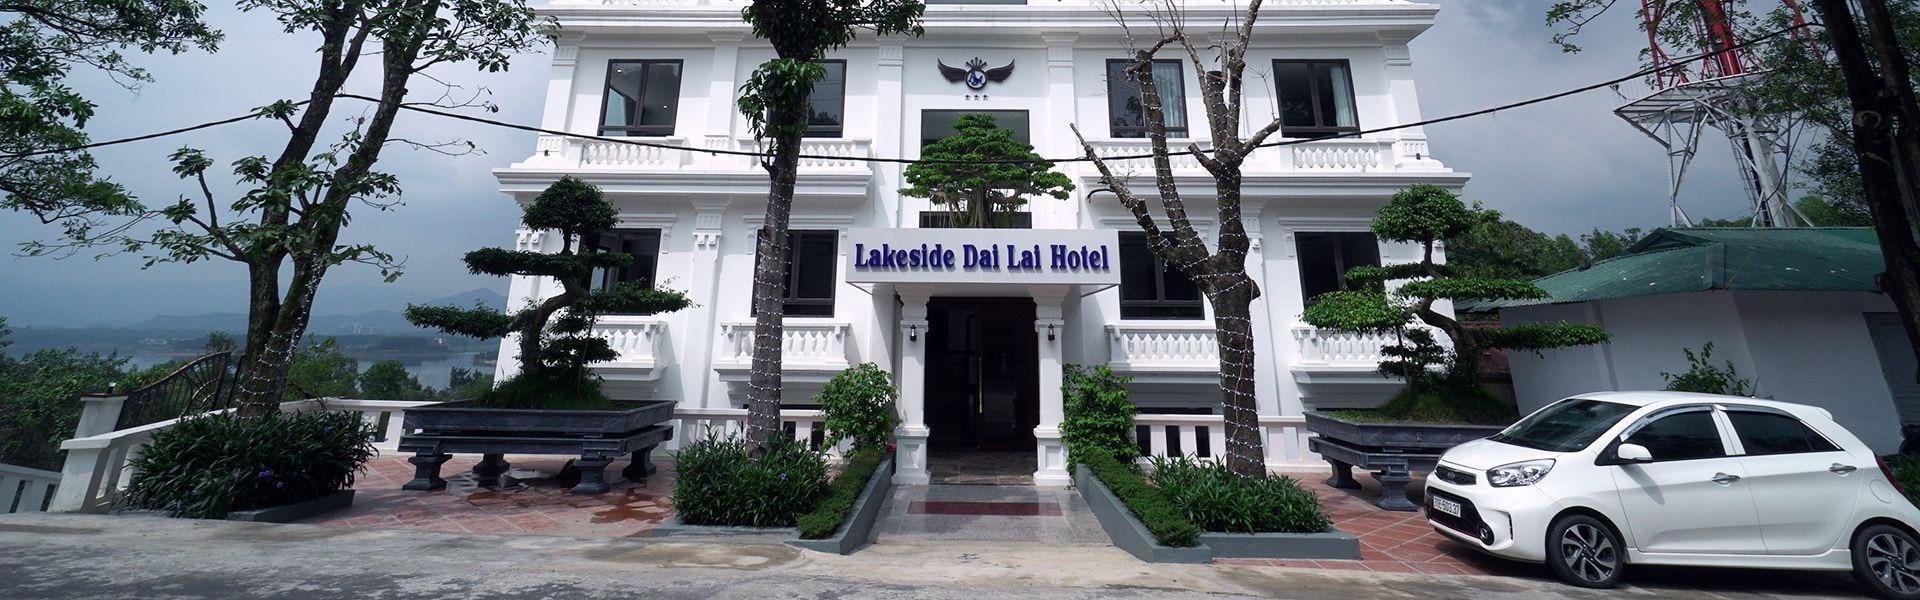 Lakeside Dailai Hotel, Phúc Yên